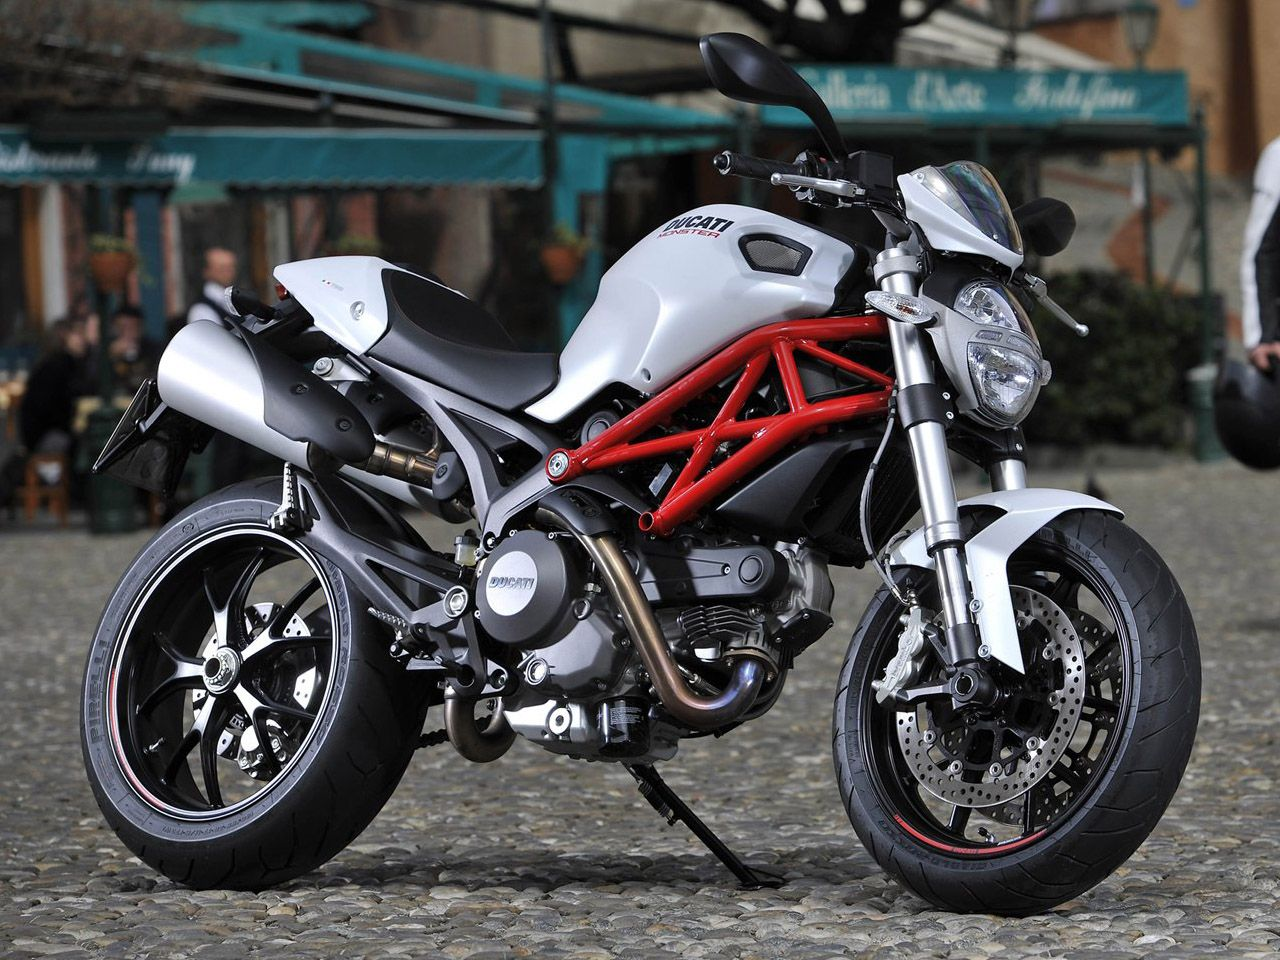 Ducati Monster 796 Ducati Monster Ducati New Ducati